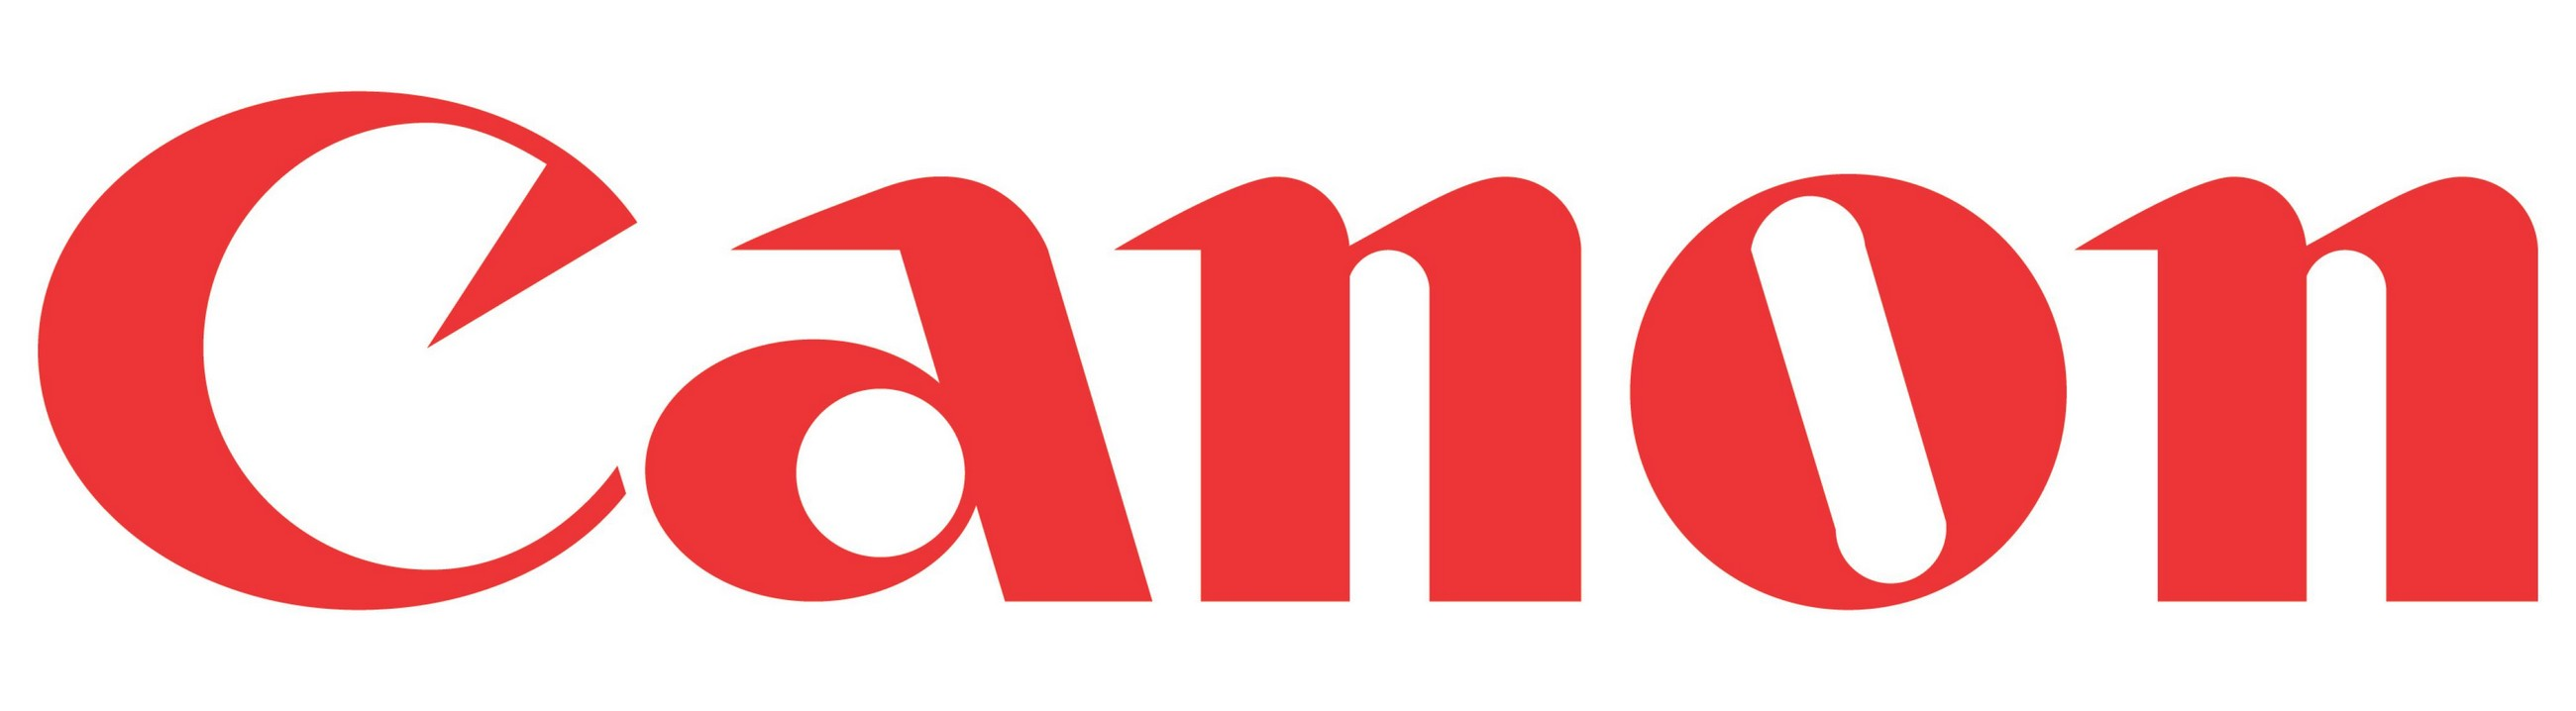 2600x718 Canon Logo Eps Png Transparent Canon Logo Eps.png Images. Pluspng